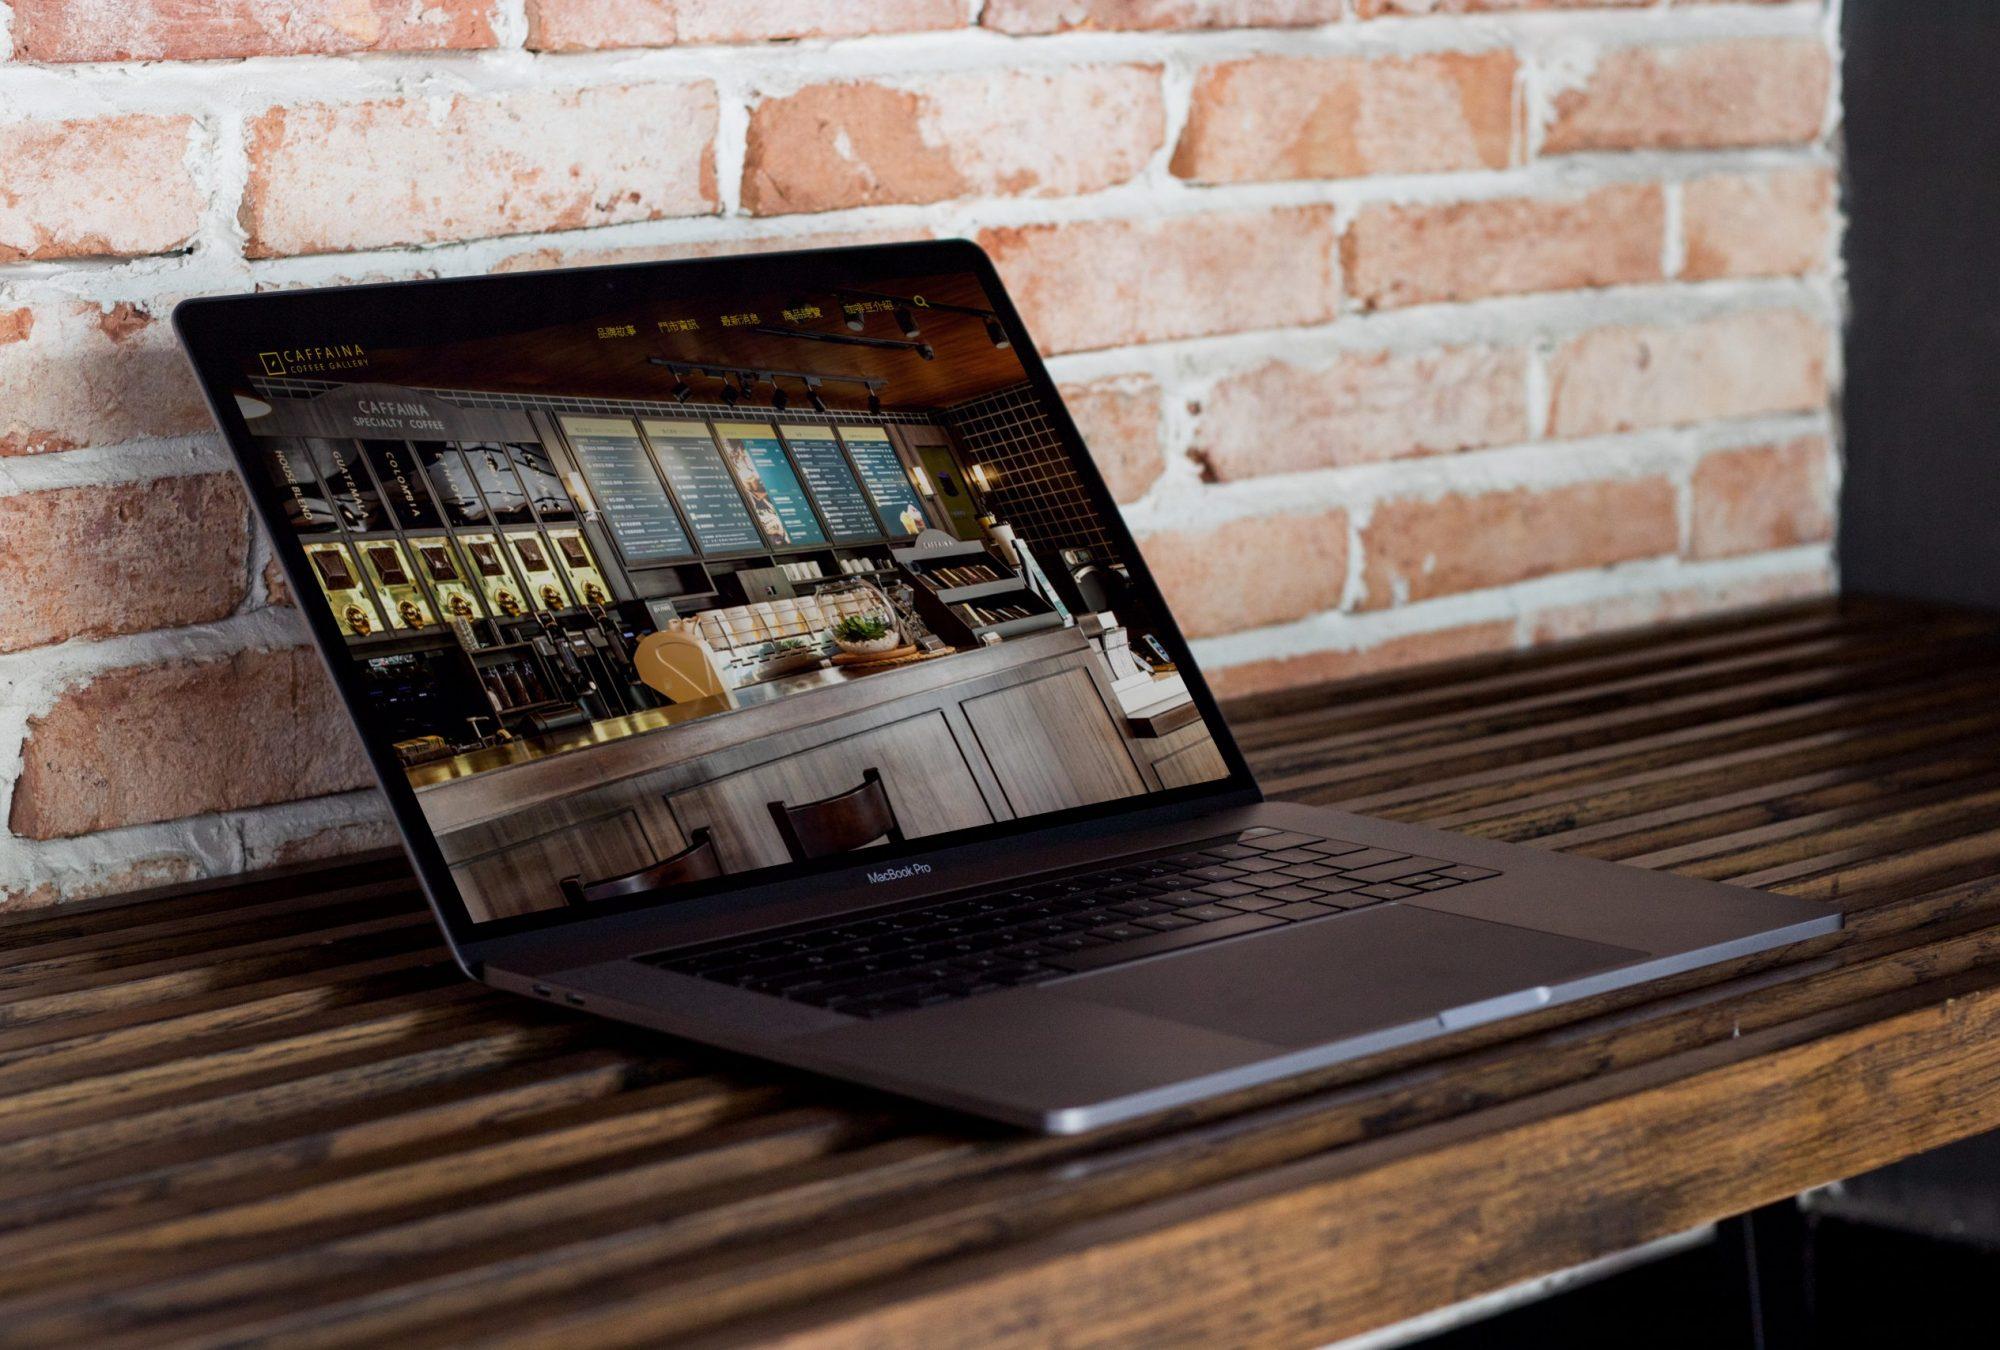 IMG_1412 Macbook Pro